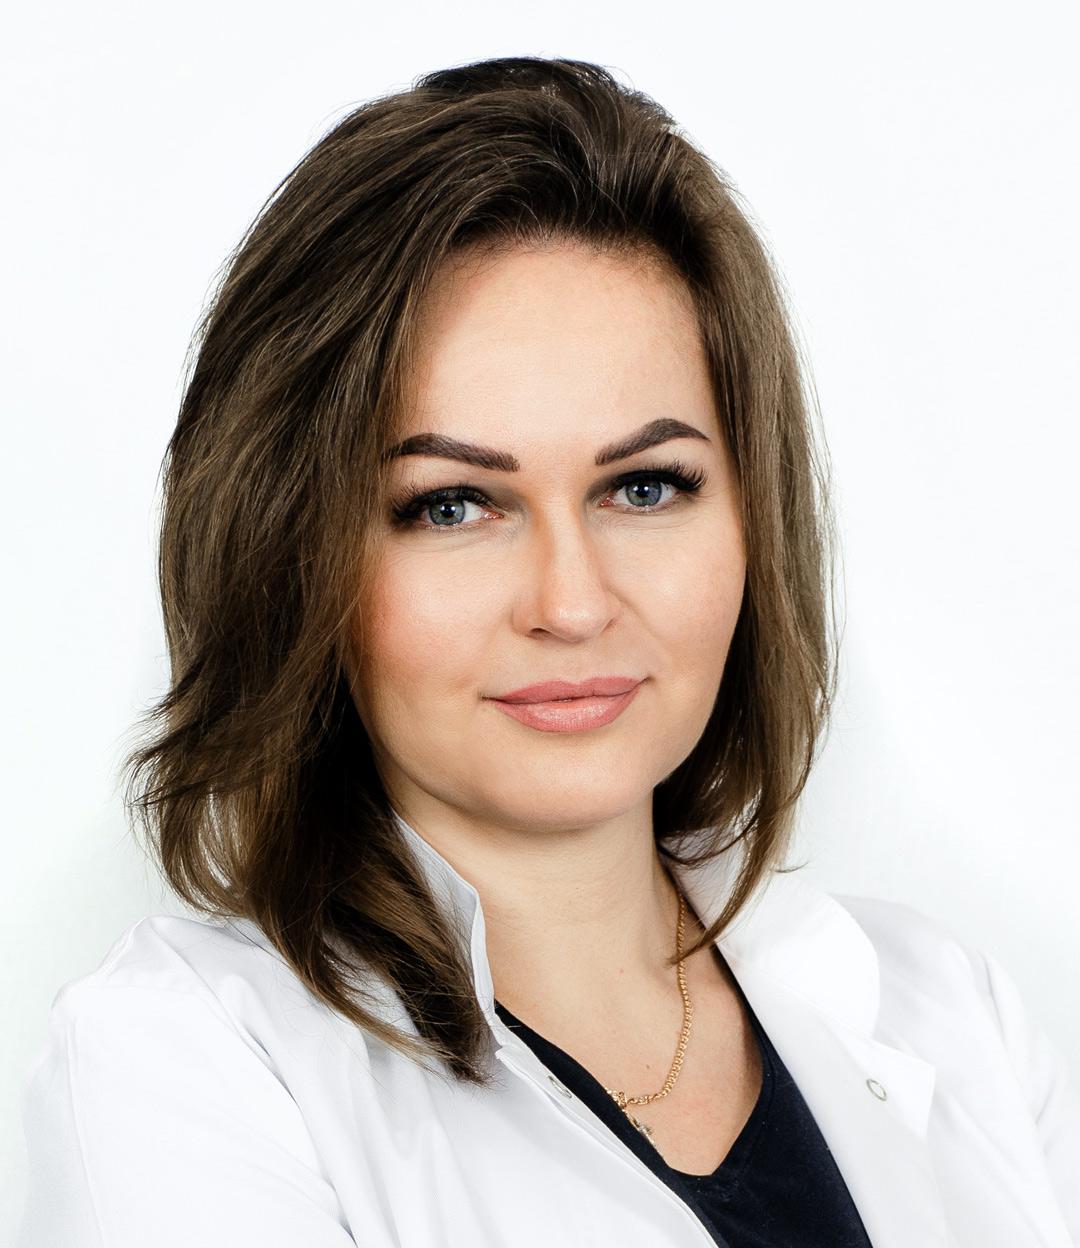 Павлова Карина Викторовна